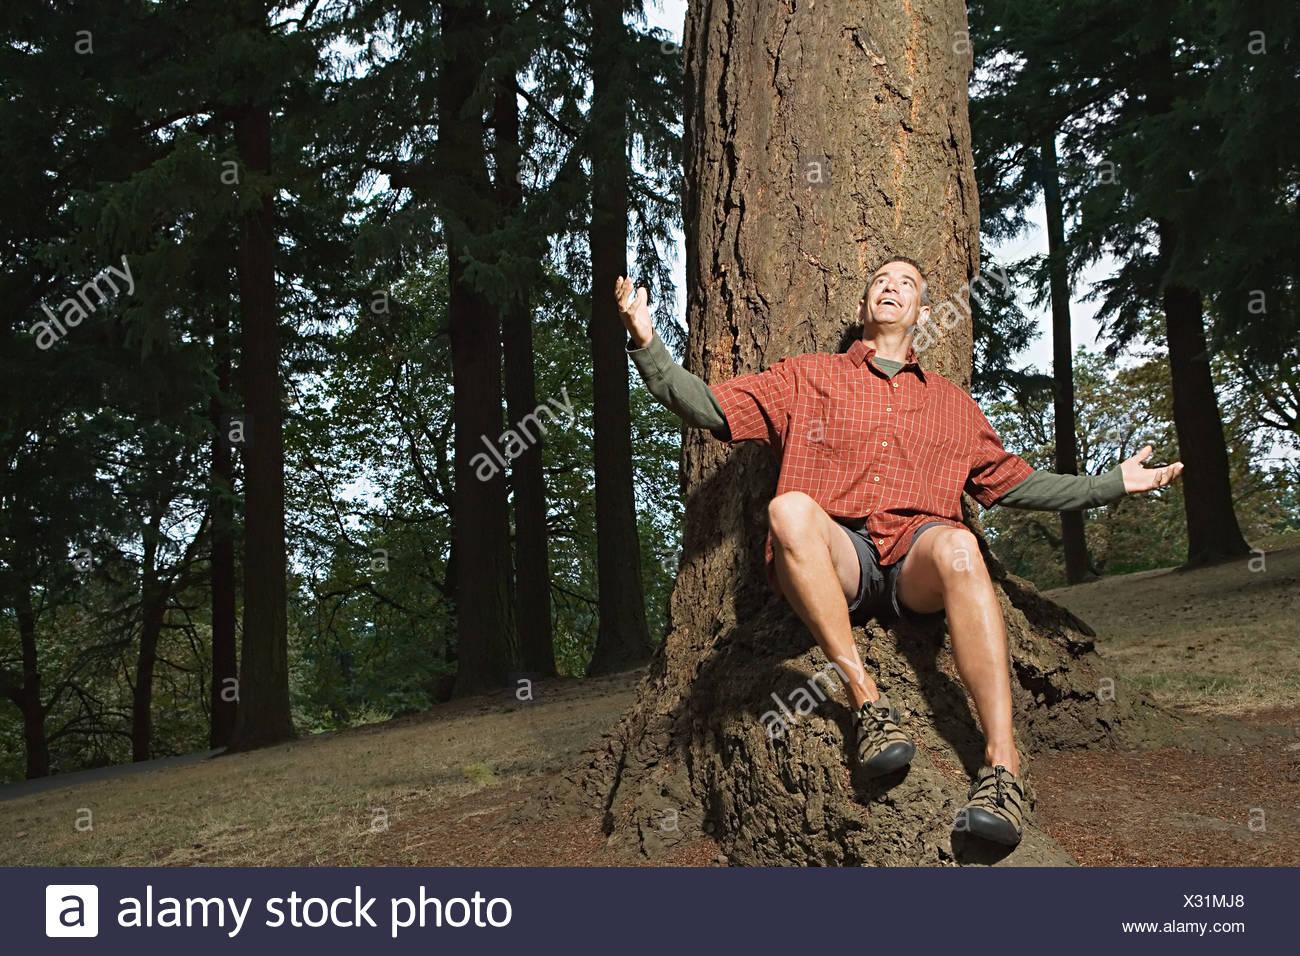 Man in awe of nature - Stock Image